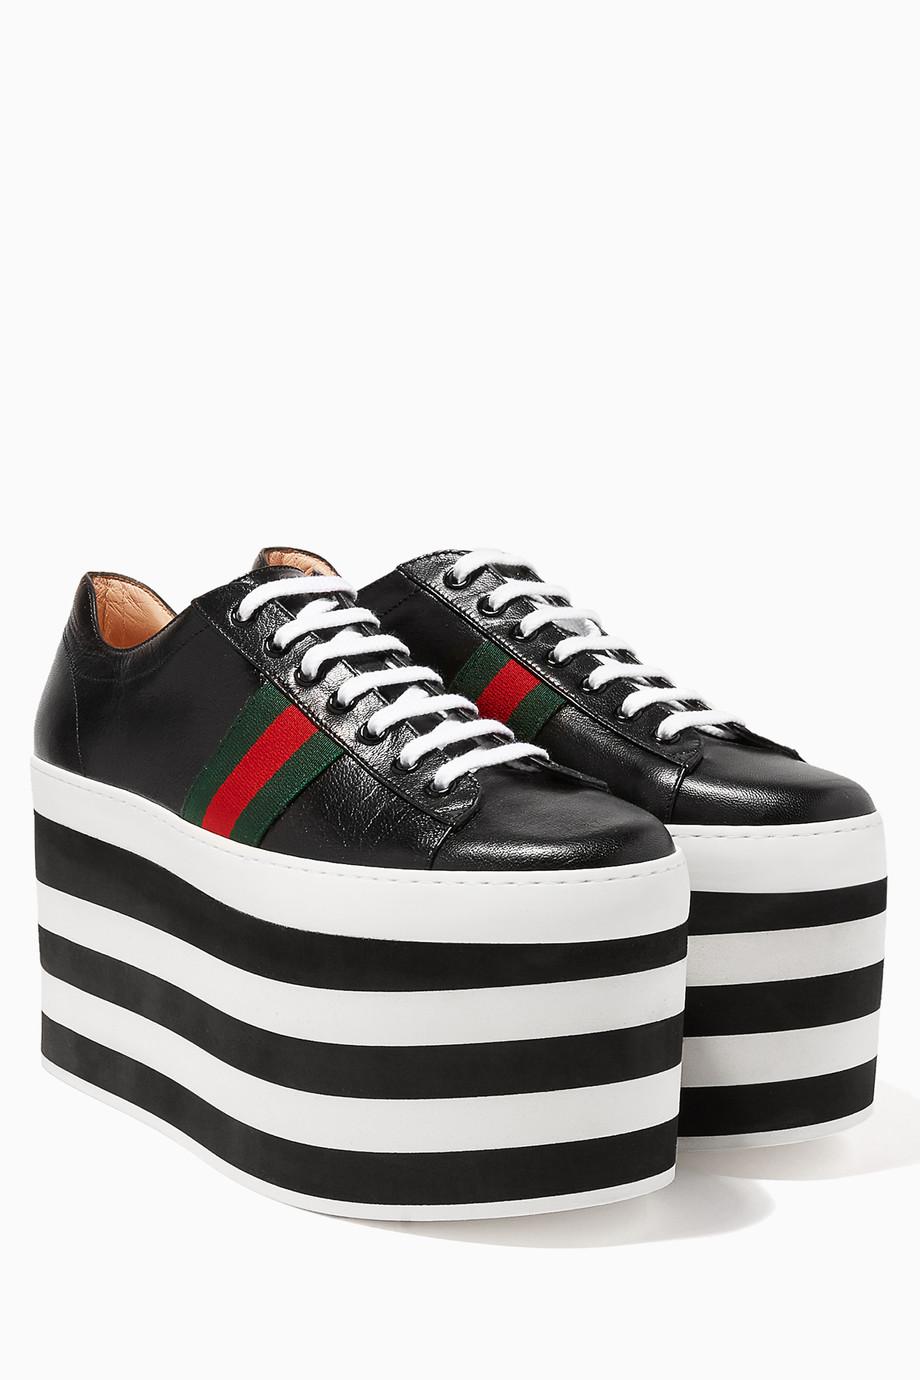 6764b2a6105 Shop Gucci Multicolour Black Leather Low-Top Platform Sneakers for ...